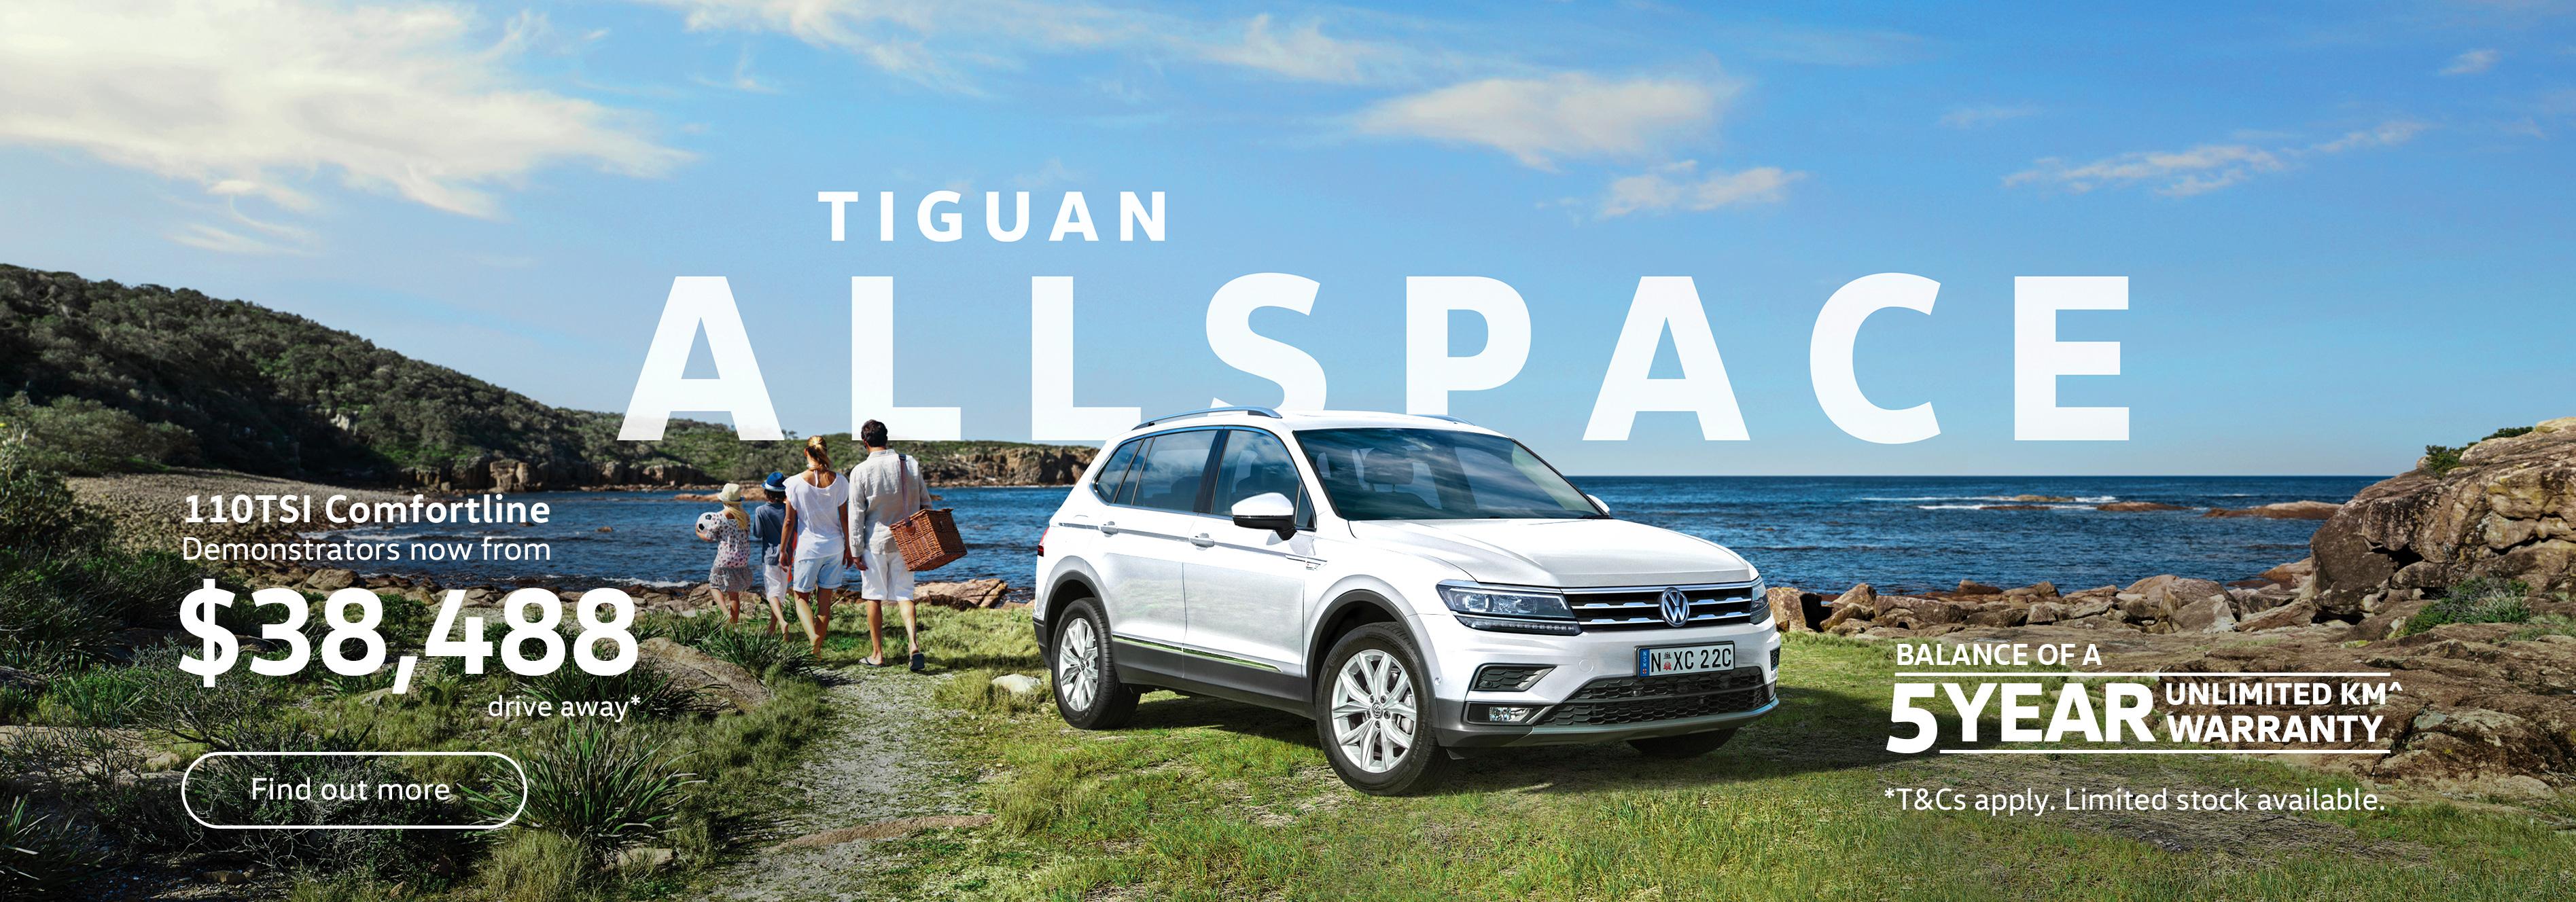 Tiguan Allspace 110TSI Comfortline from $38,488 driveaway